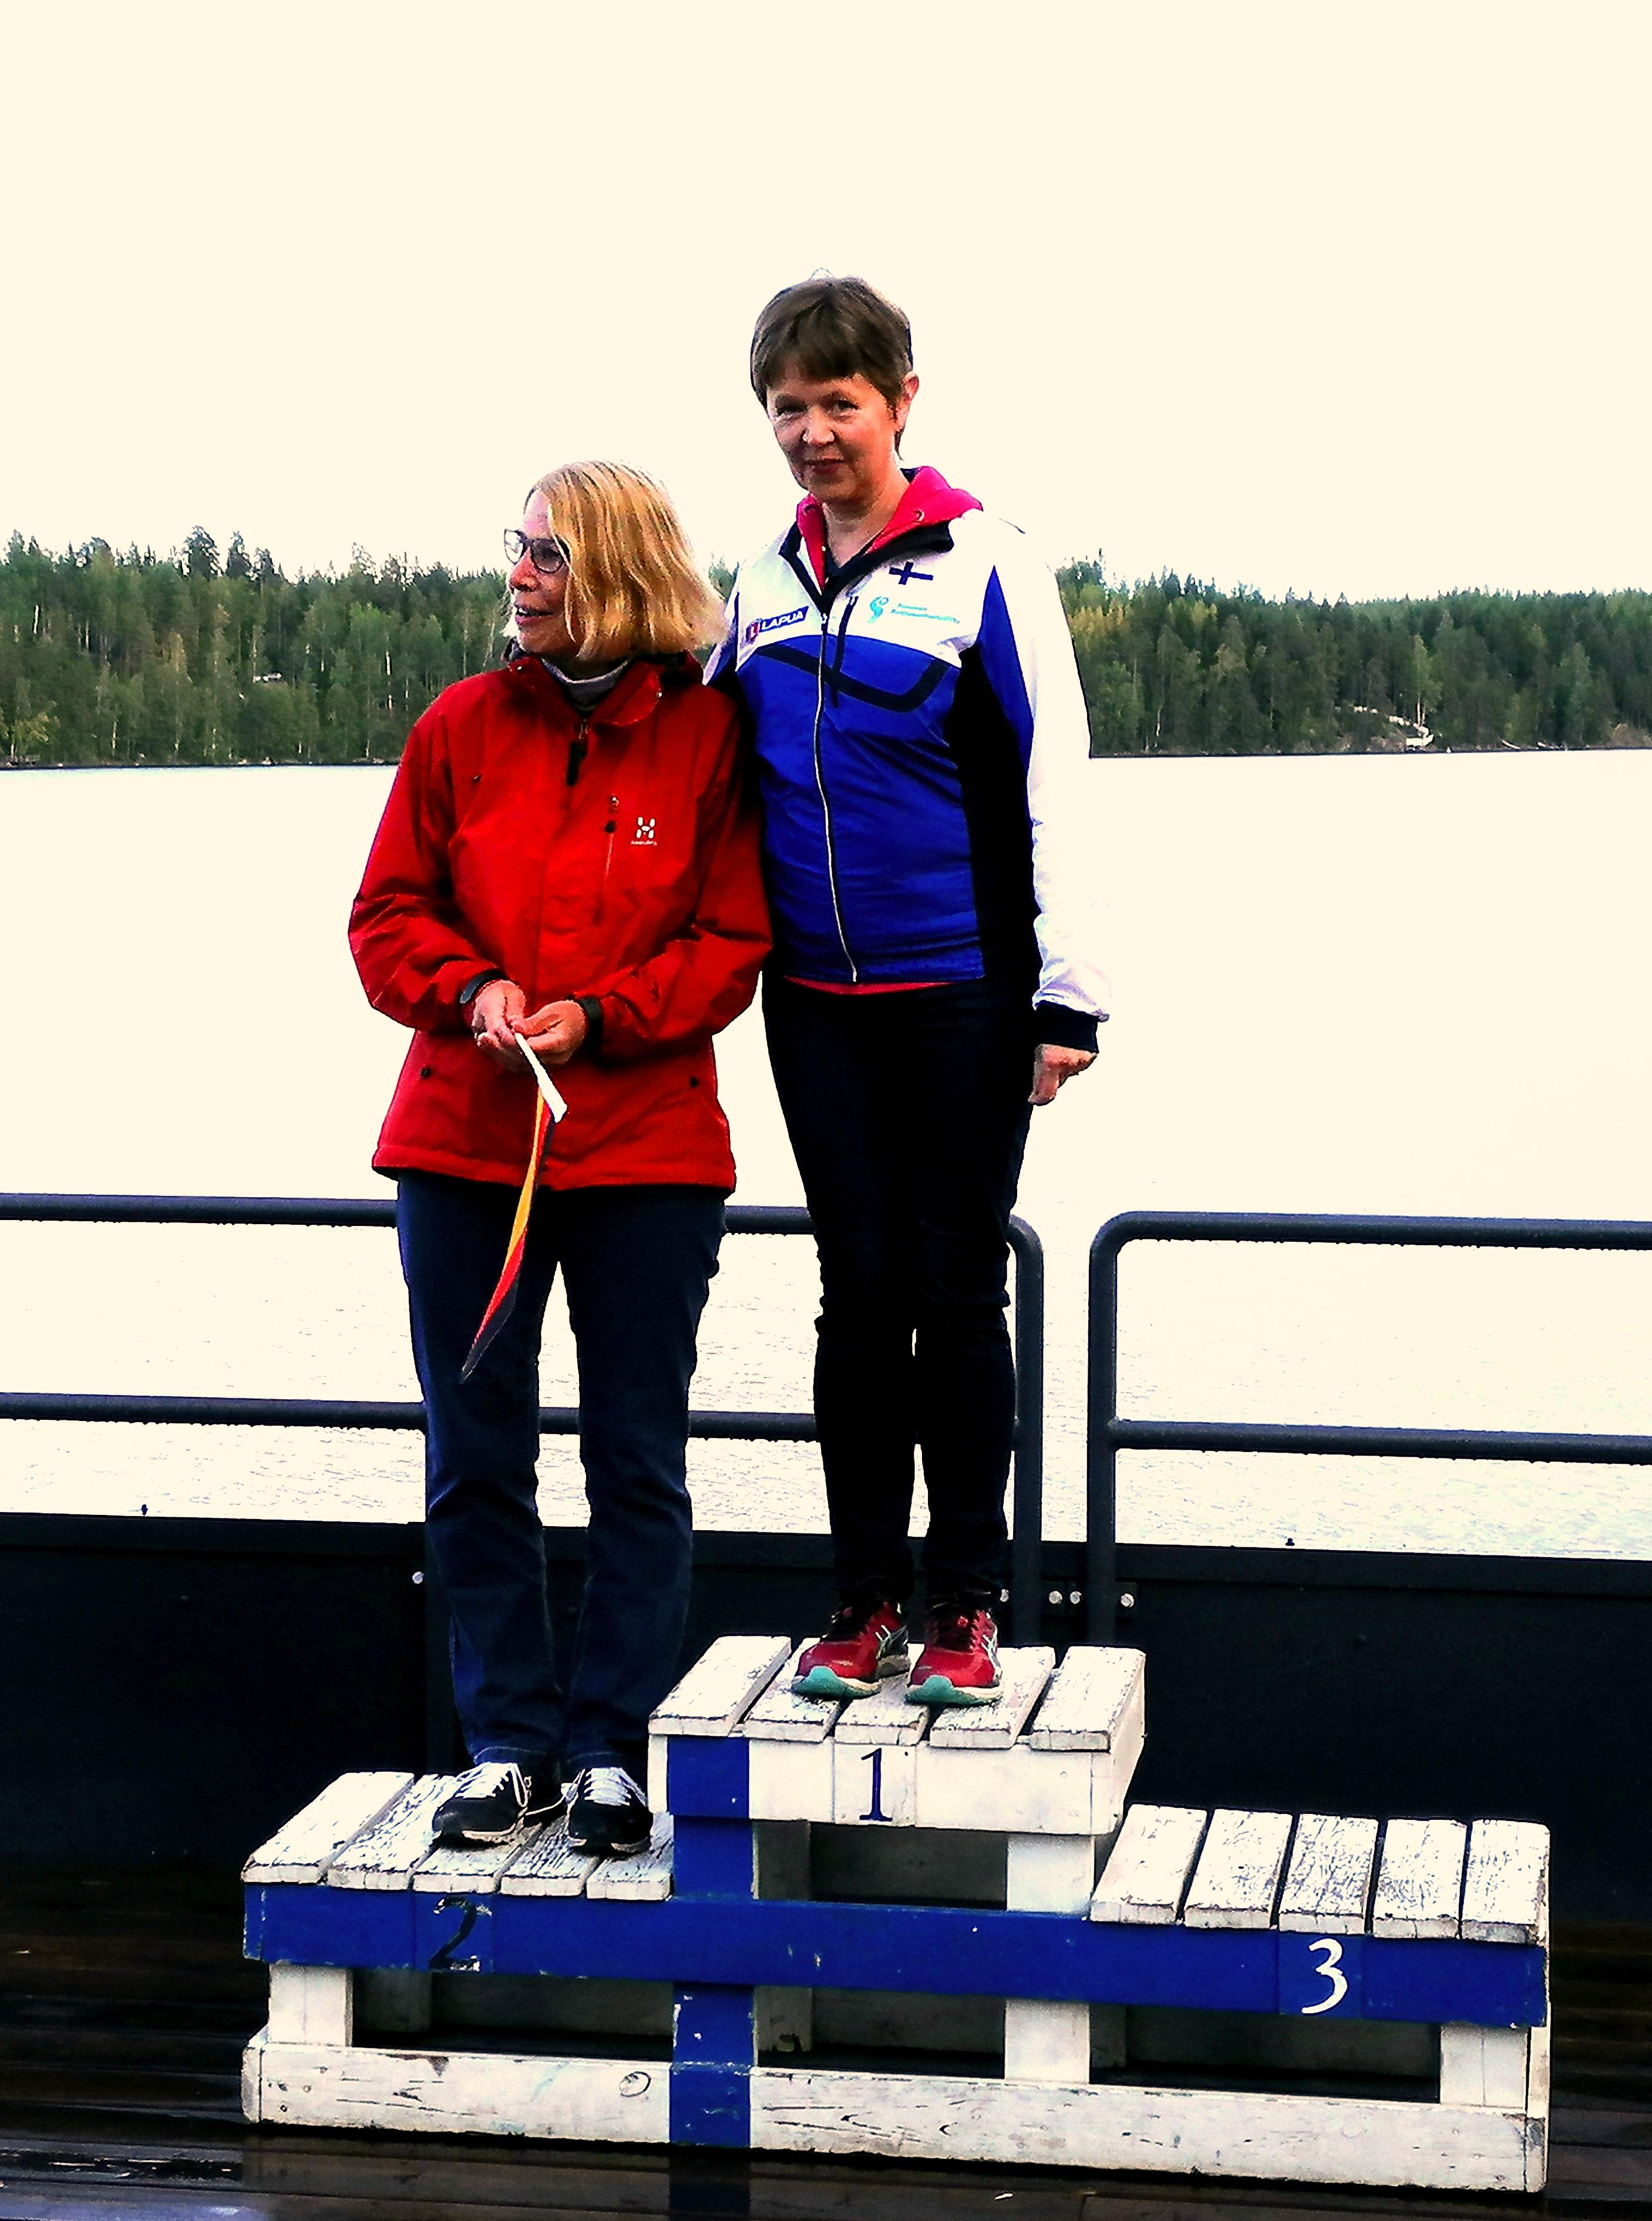 wm-in-biathlon-ol-3.jpg